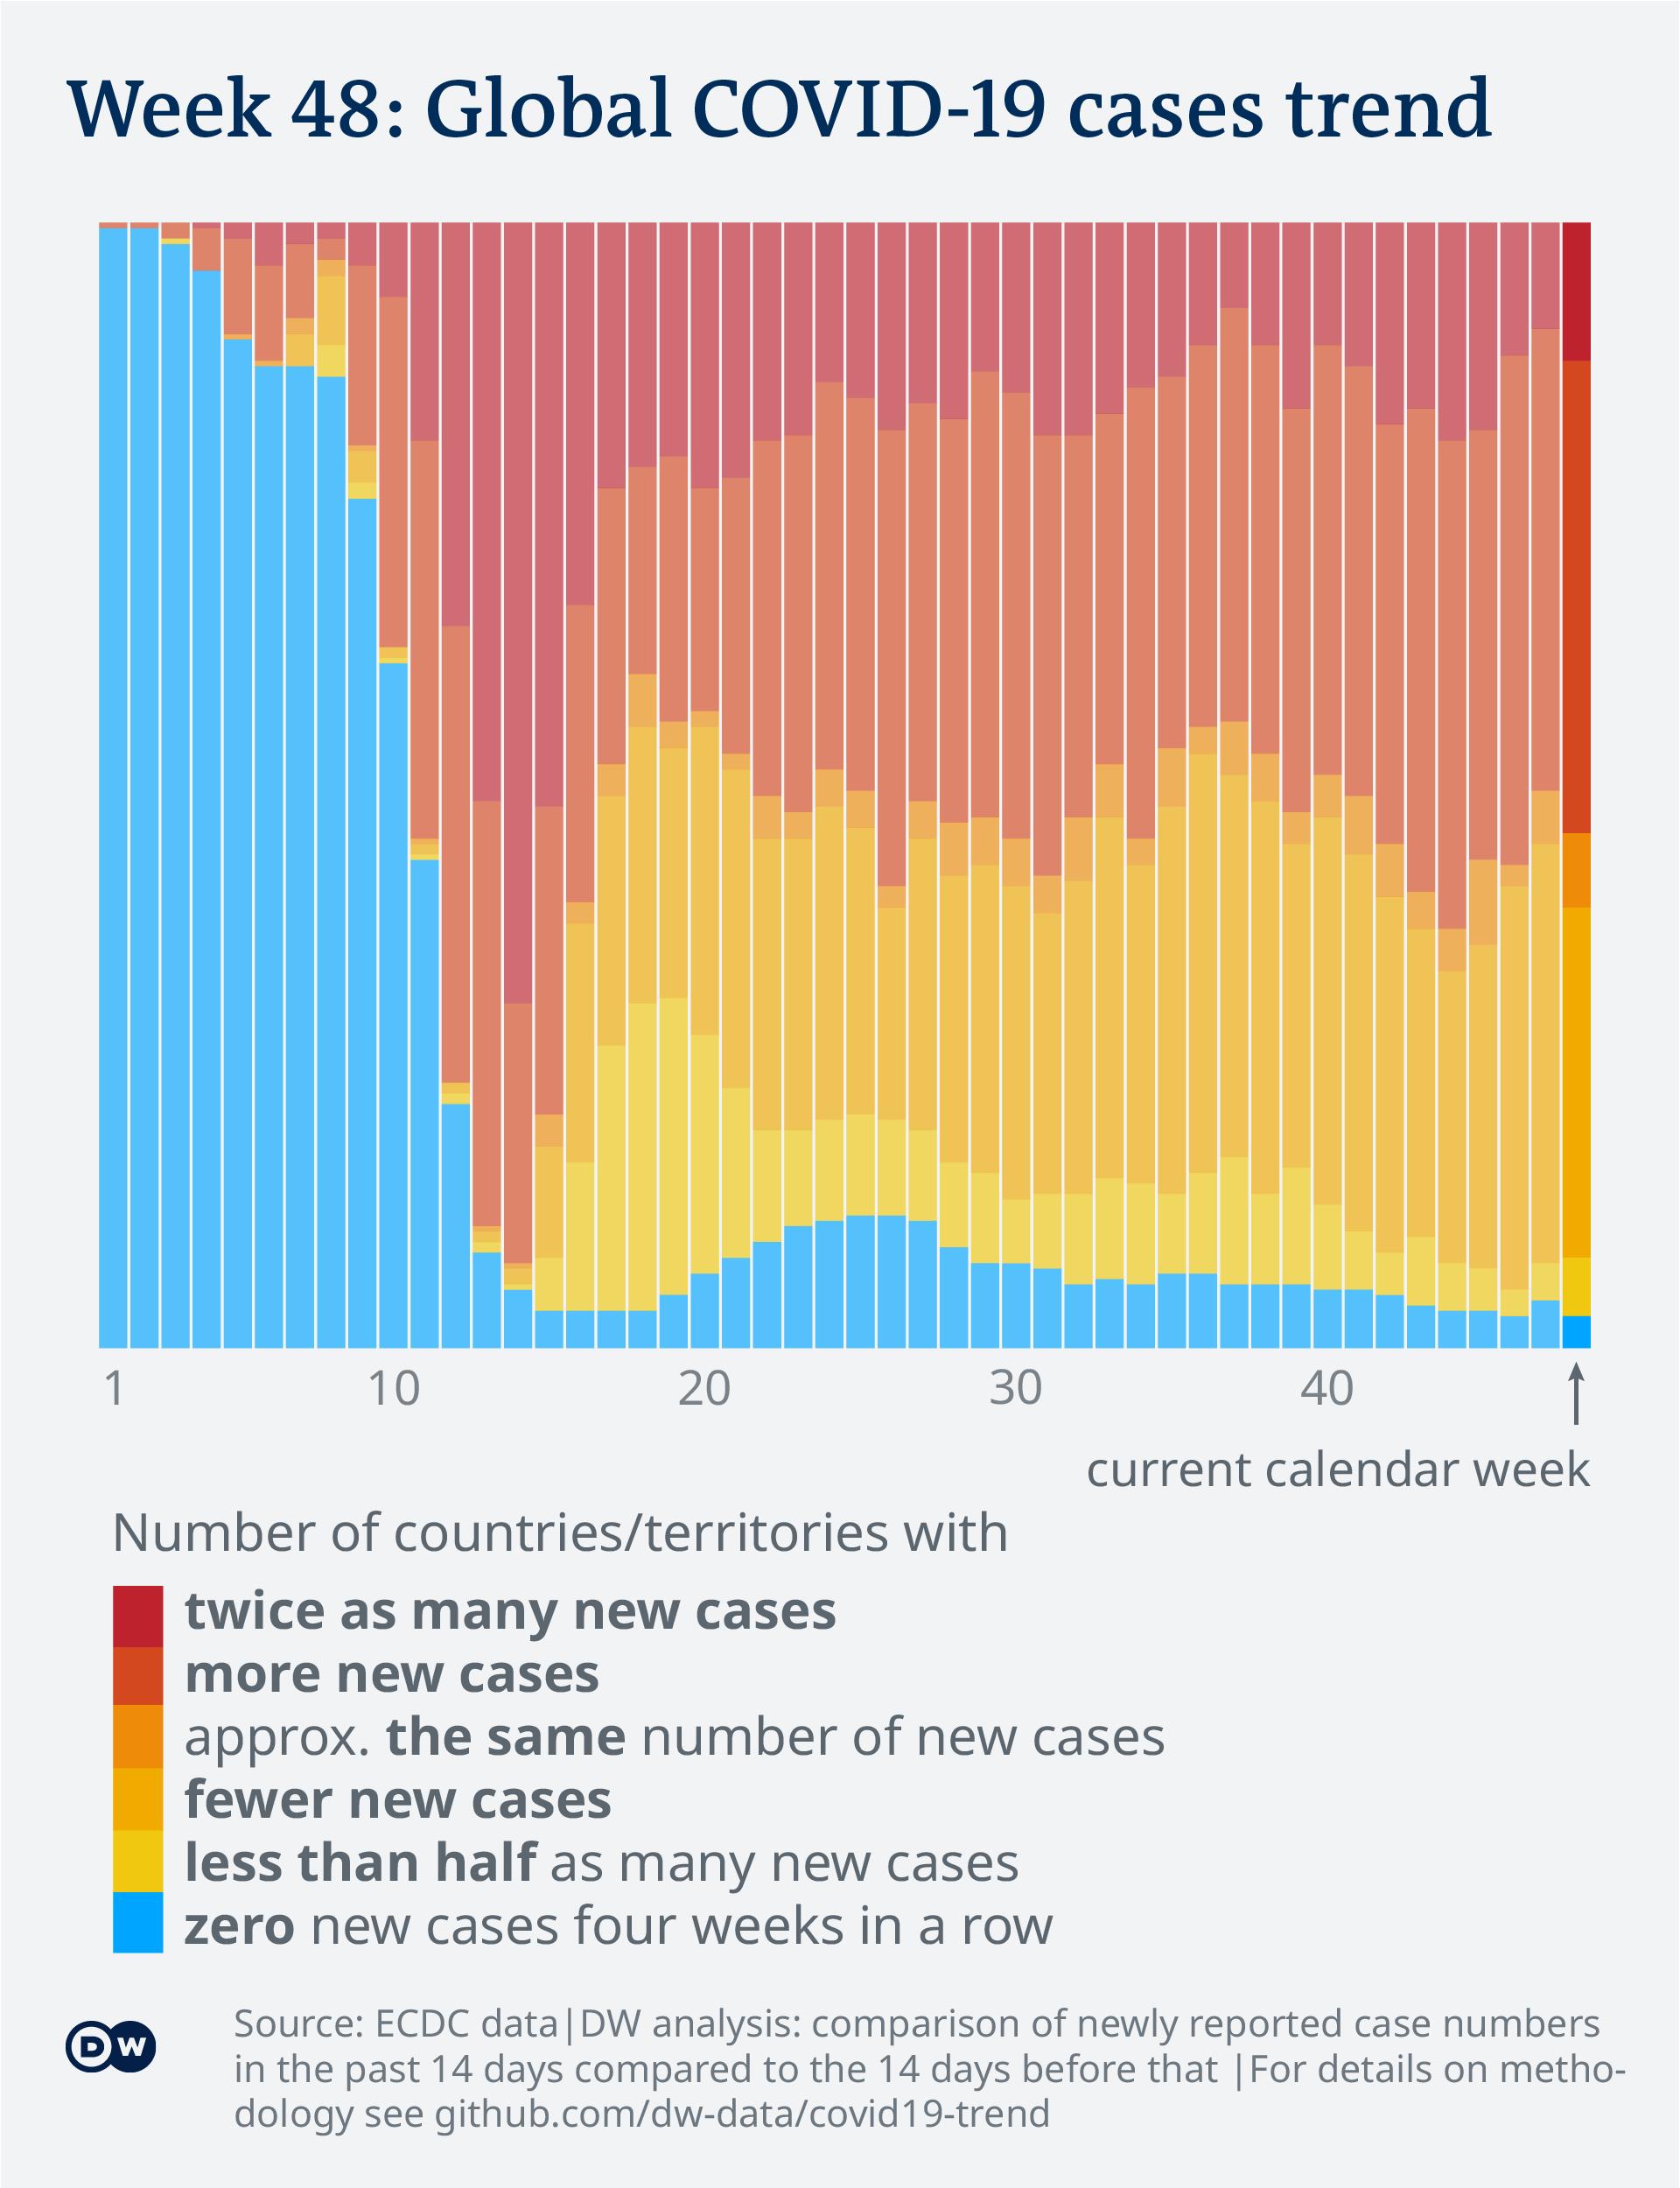 Data visualization: COVID-19 global new case numbers trend - until calendar week 48